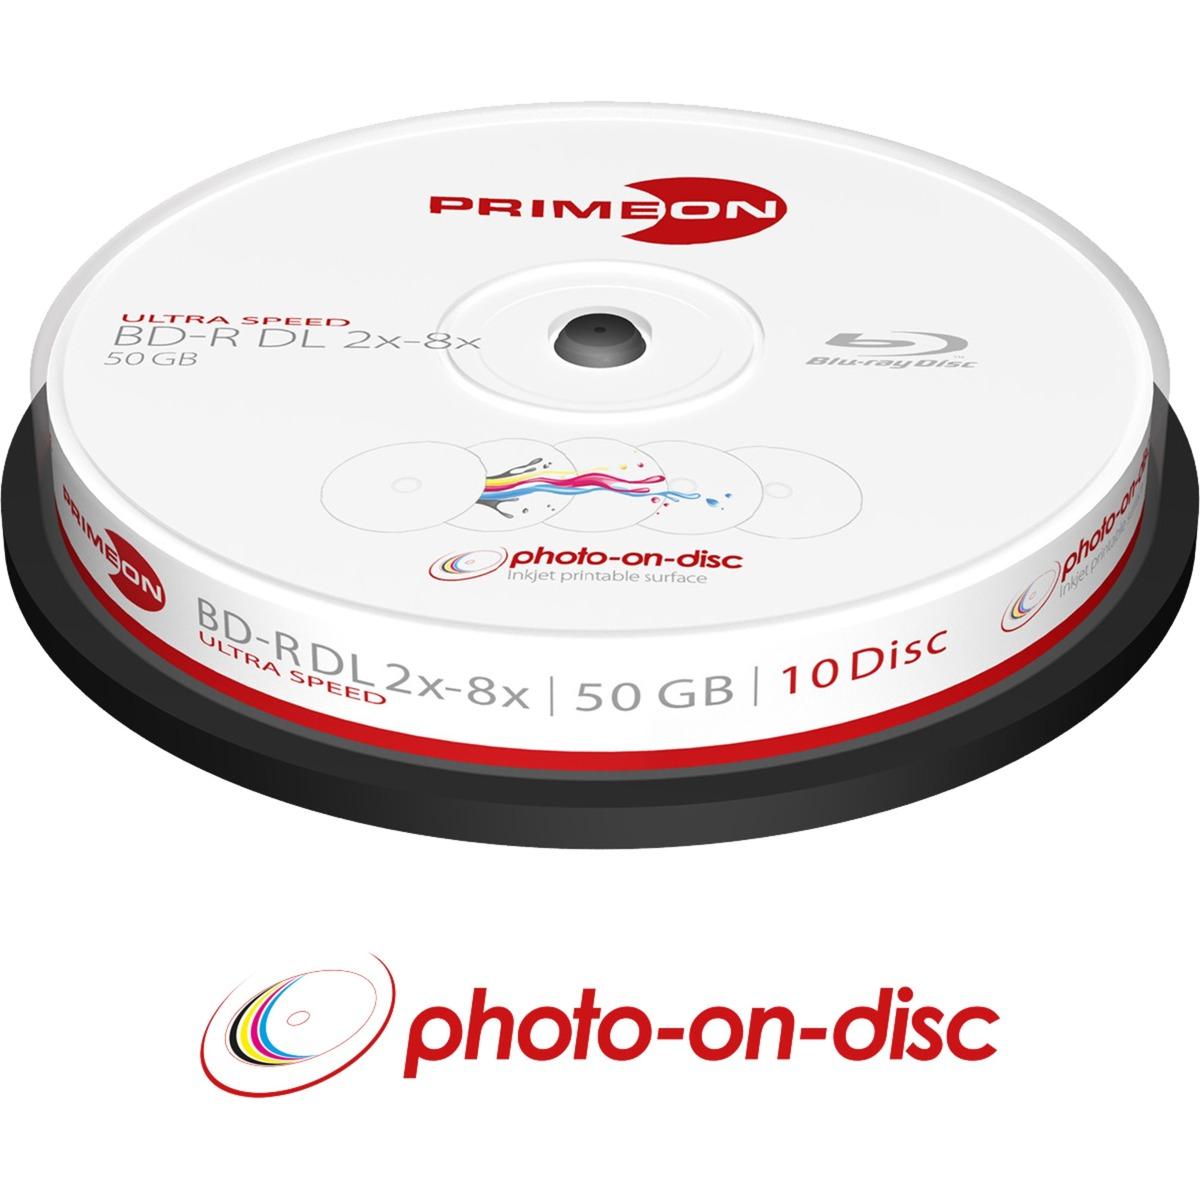 2761312 50GB BD-R DL disco blu-ray lectura/escritura (BD), Discos Blu-ray vírgenes